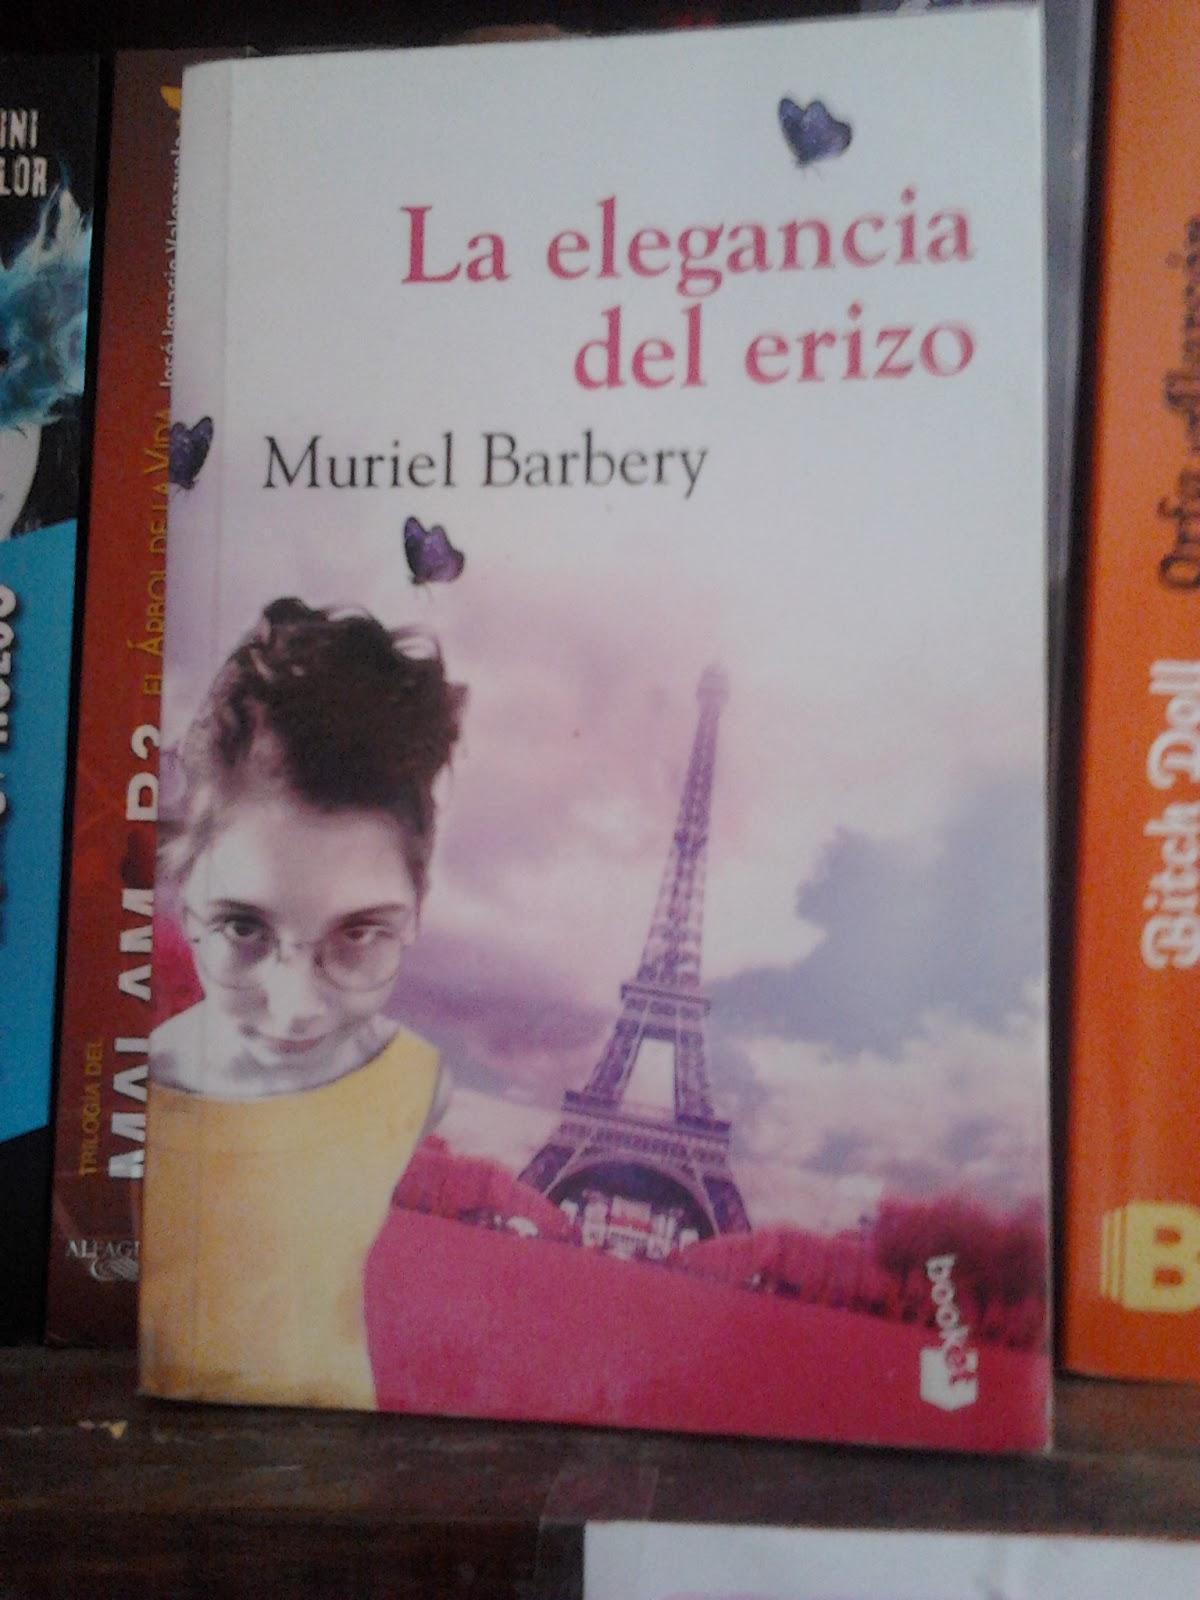 http://aruka-capulet-marsella.blogspot.mx/2013/12/campanarescatando-libros-2014.html#more